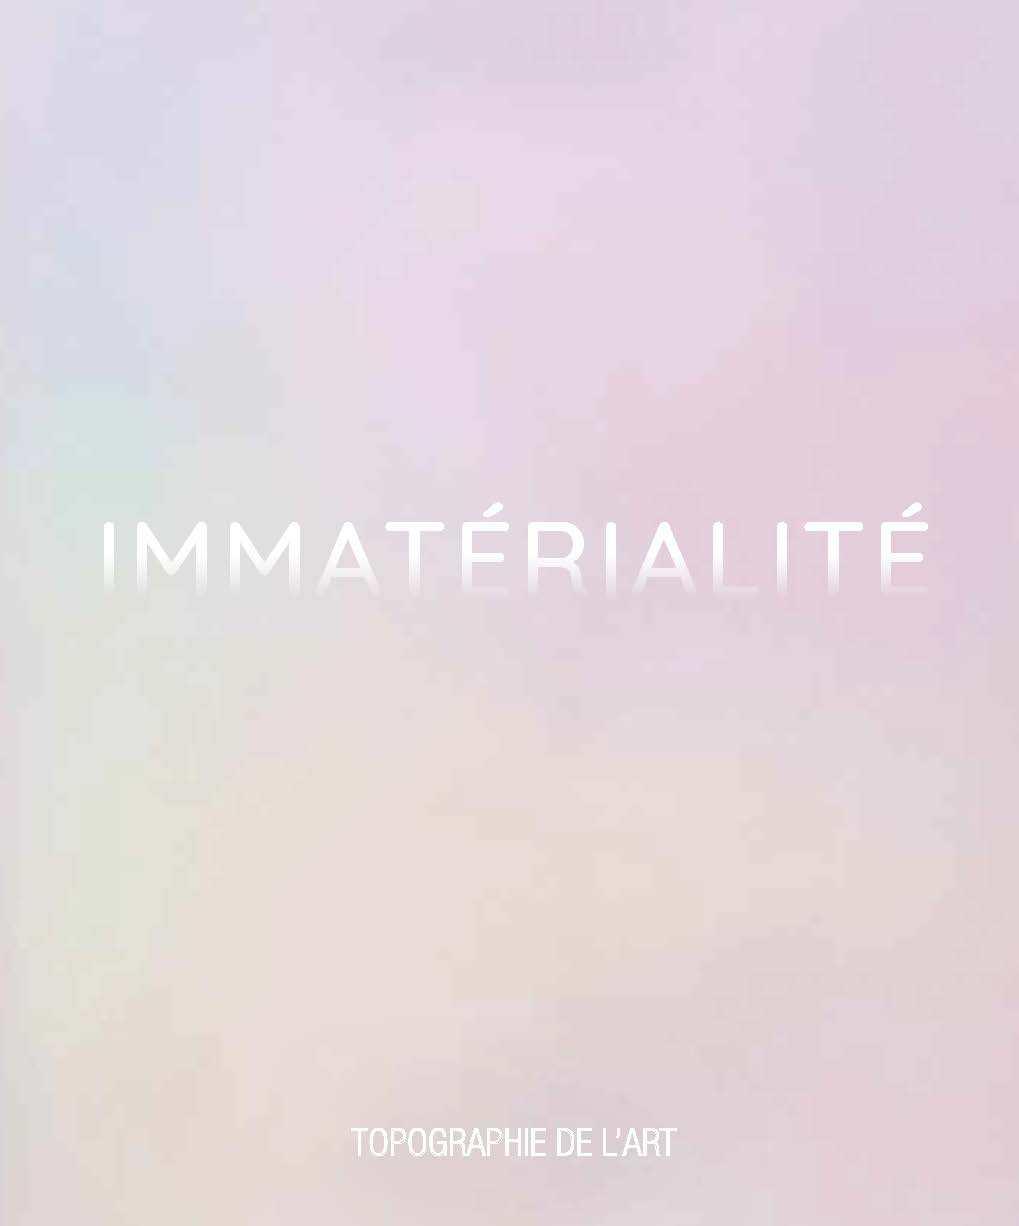 IMMATERIALITE